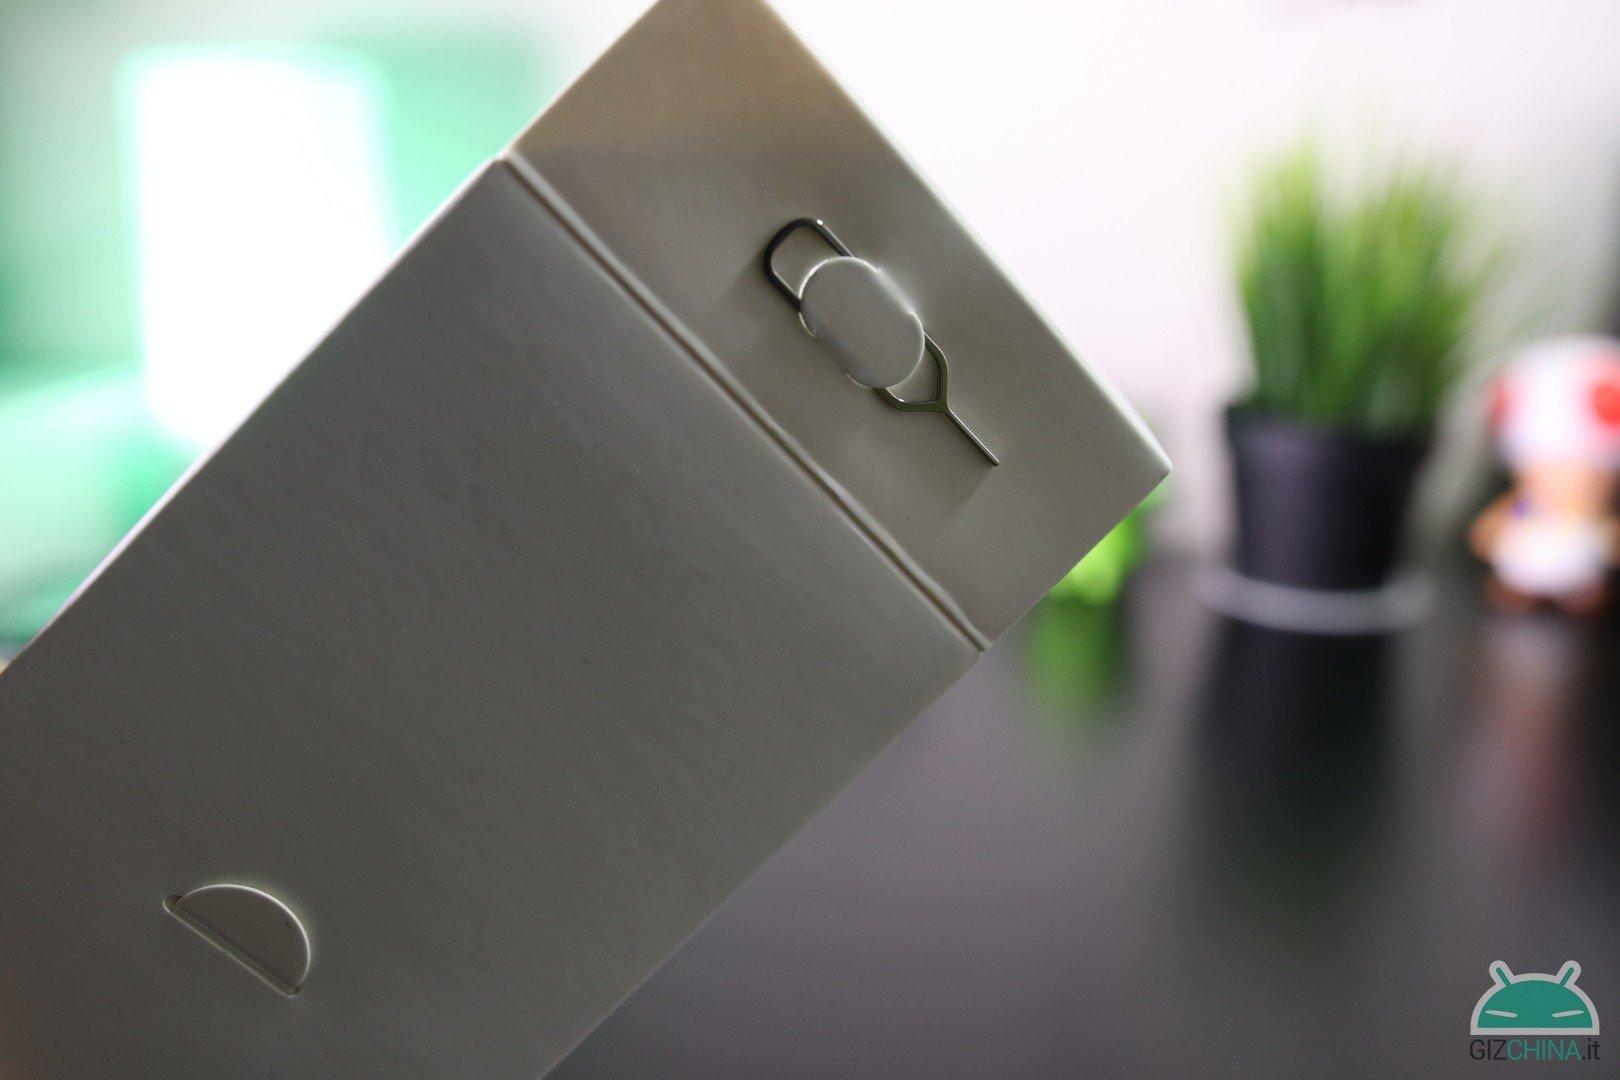 Xiaomi Mi 5X foto telefono